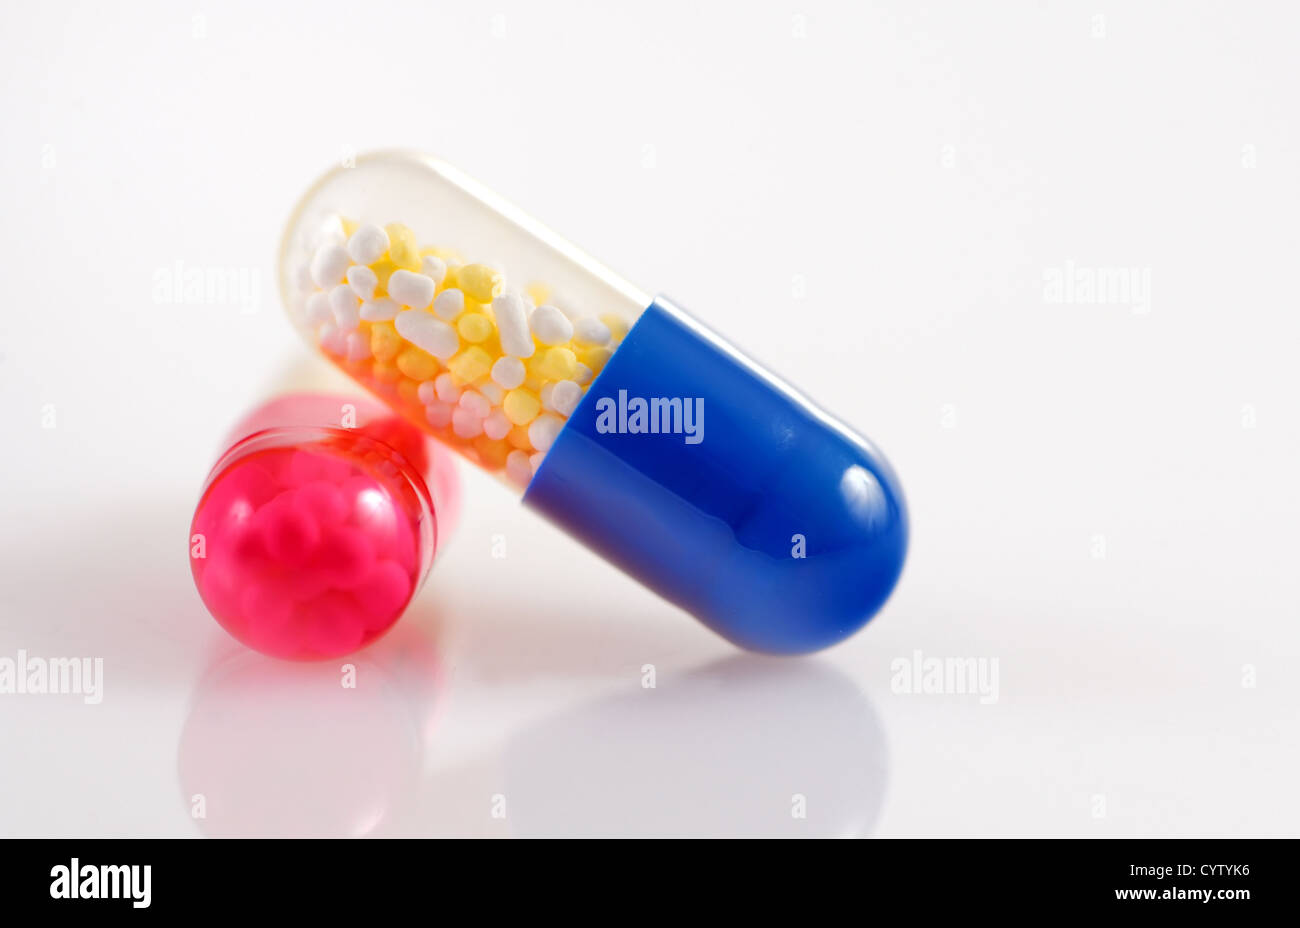 pills - Stock Image